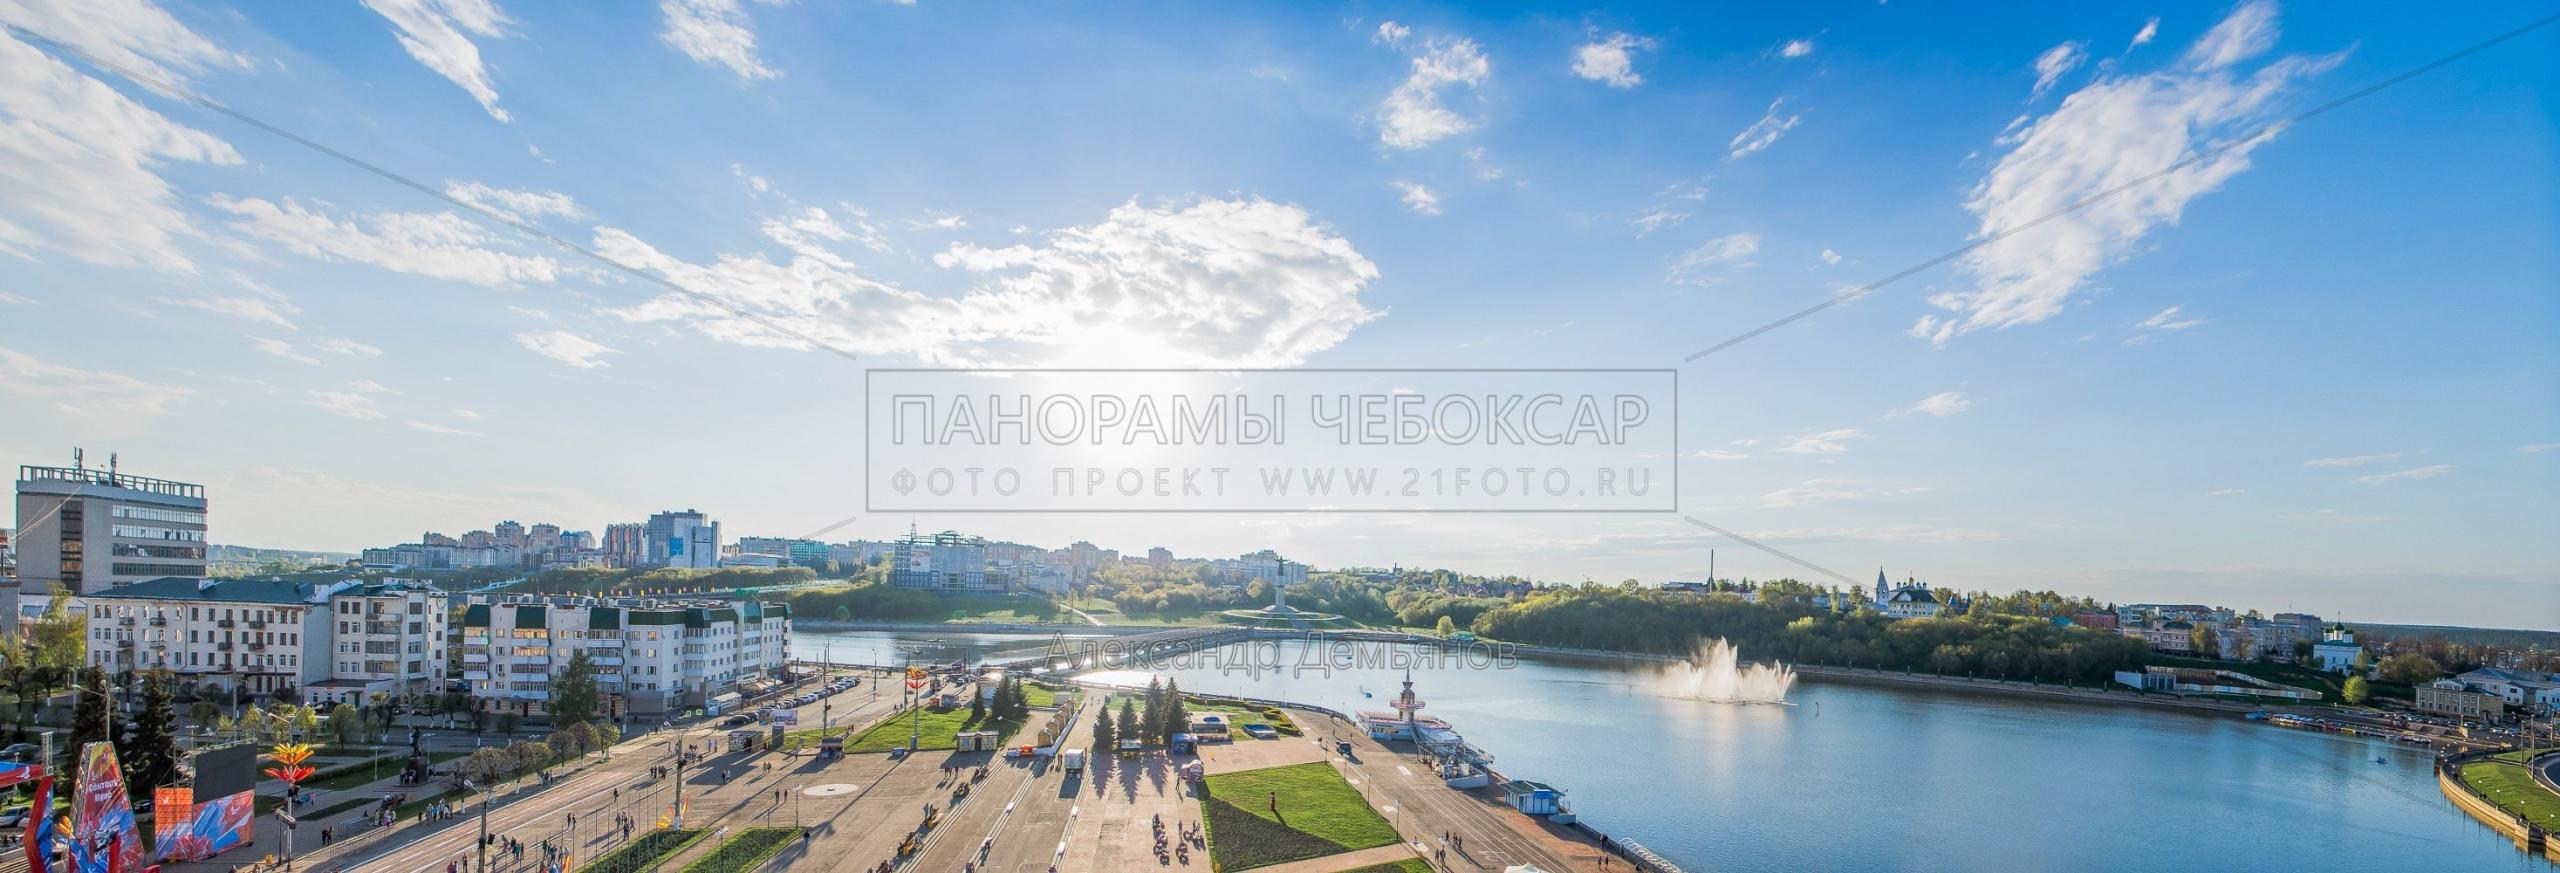 Вид на Чебоксарский залив с колеса обозрения на Красной площади летом 2016  (Версия 2)